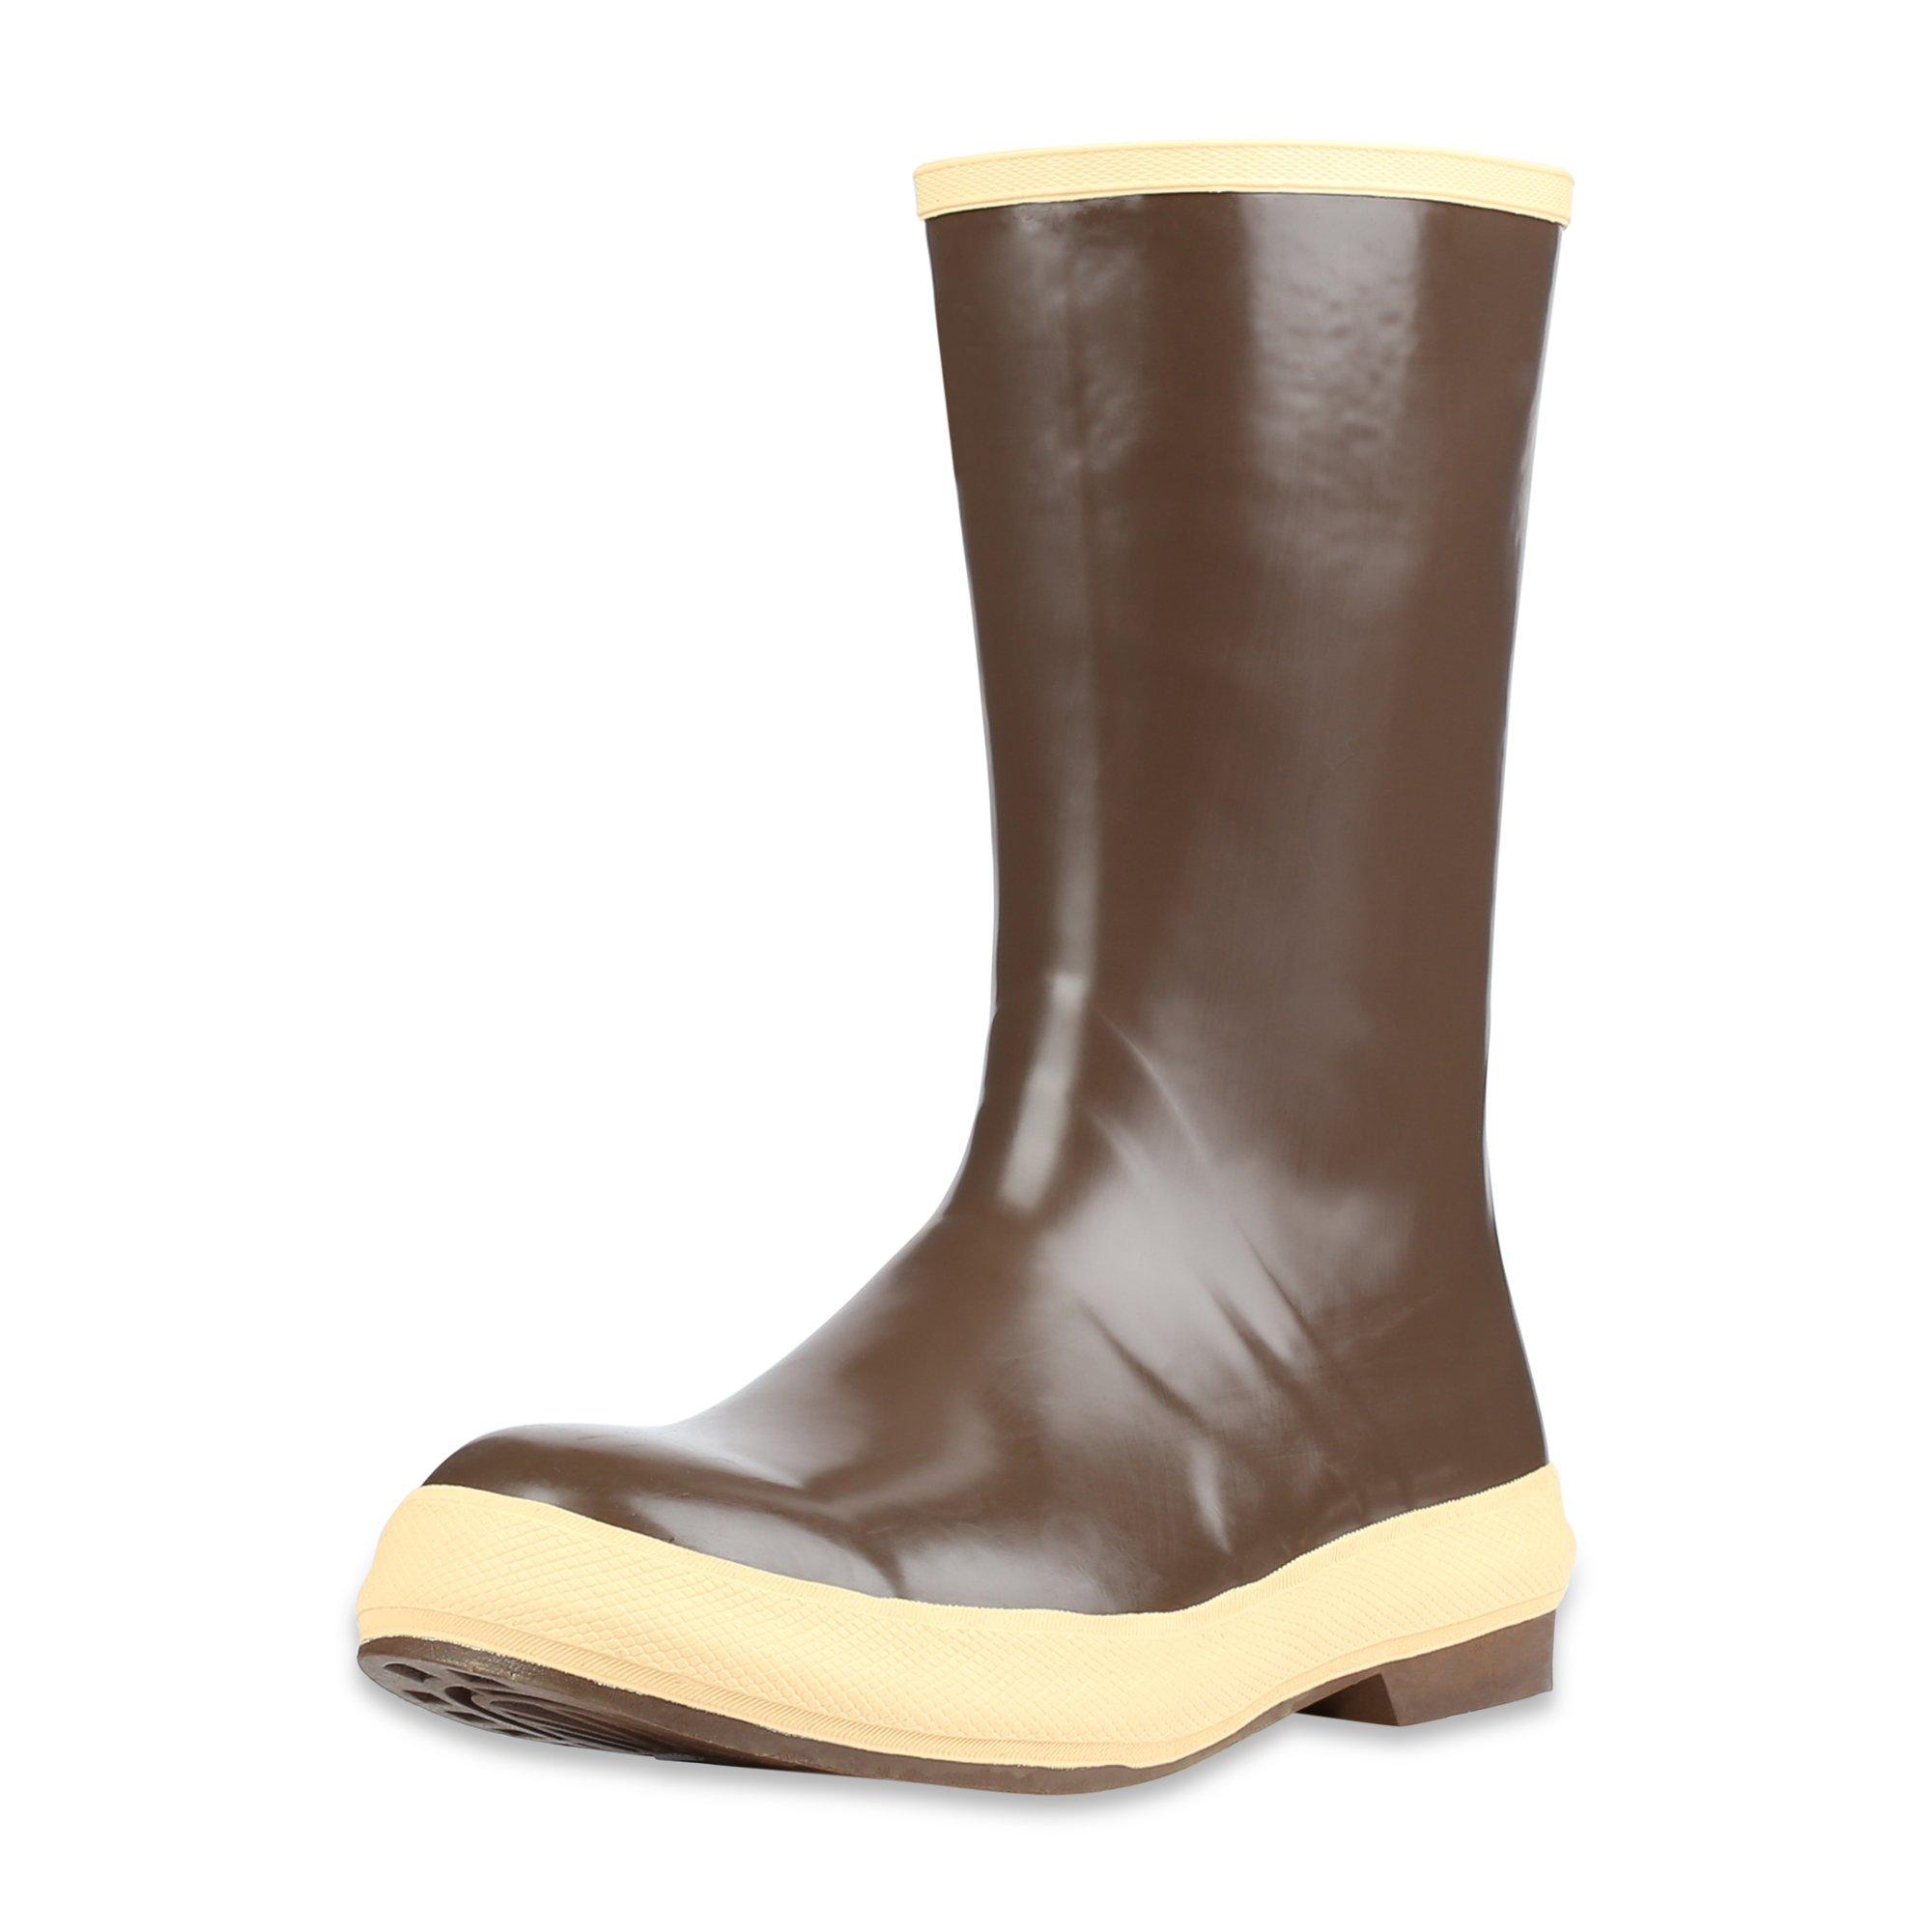 Servus 12'' Neoprene Soft Toe Men's Work Boots with Chevron Outsole, Copper & Tan (22115) by Honeywell